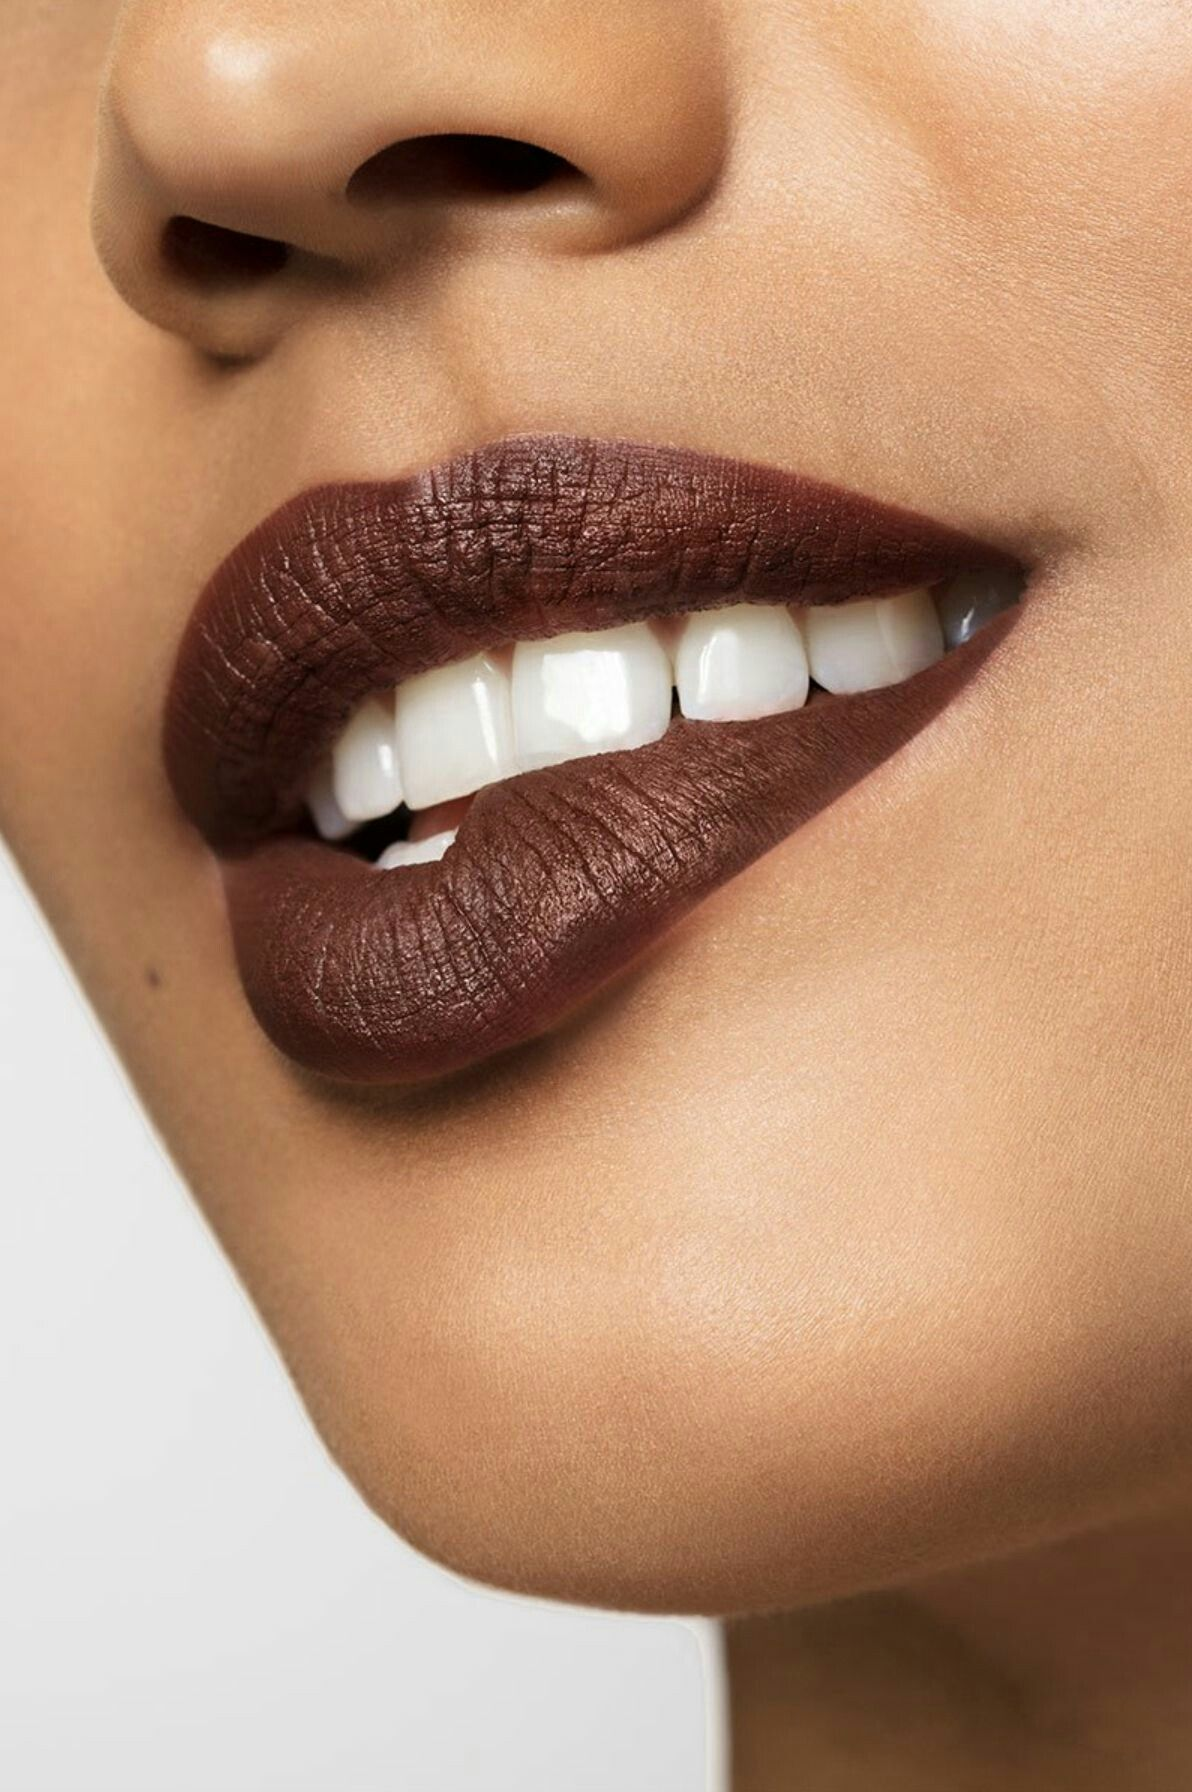 Pin von Artūras Pocius auf POP ART Rote lippen